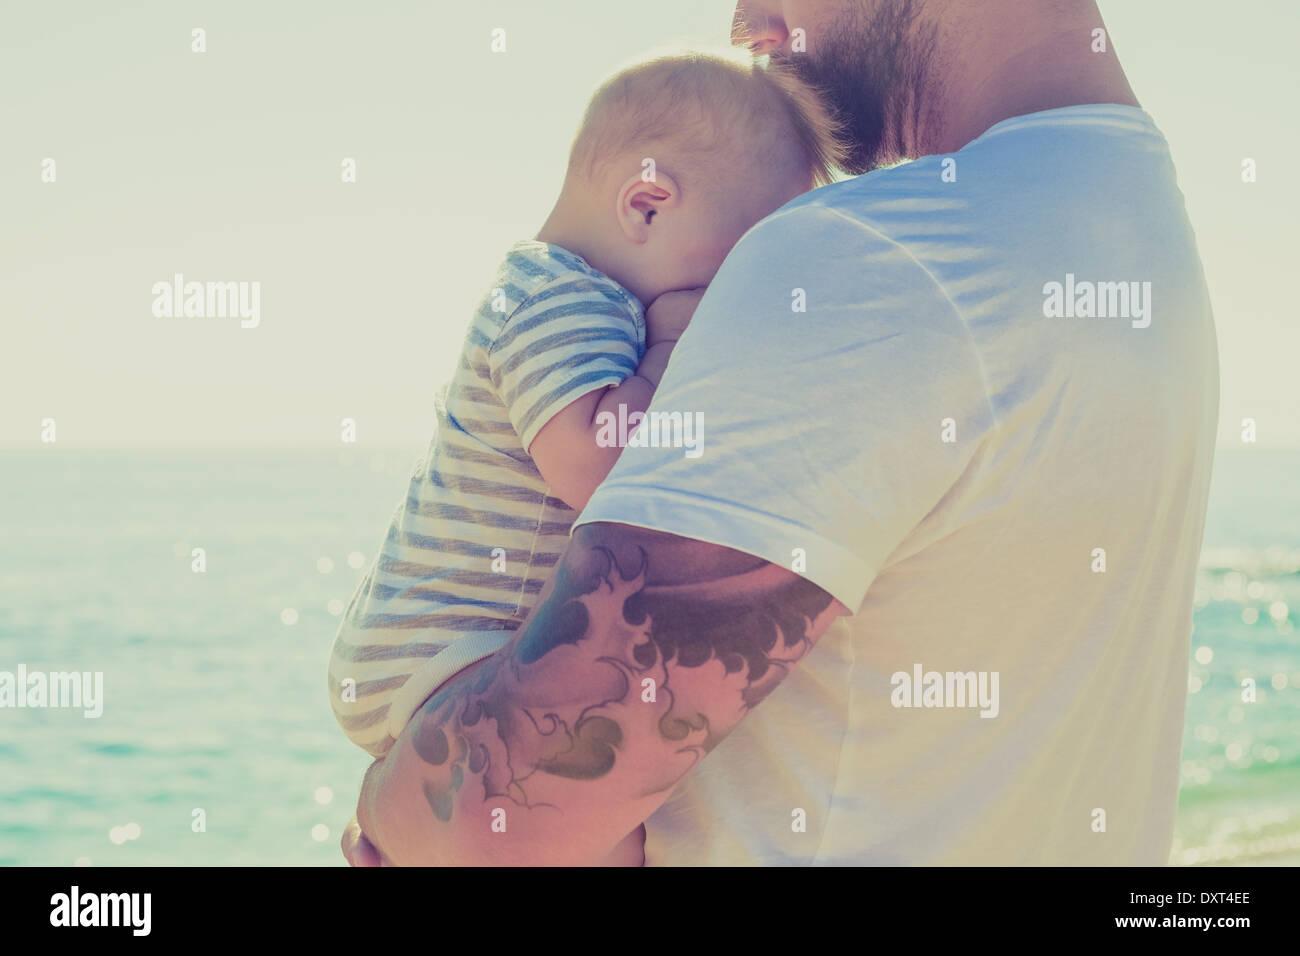 Nahaufnahme von Vater hält Baby Sohn am Strand Stockfoto